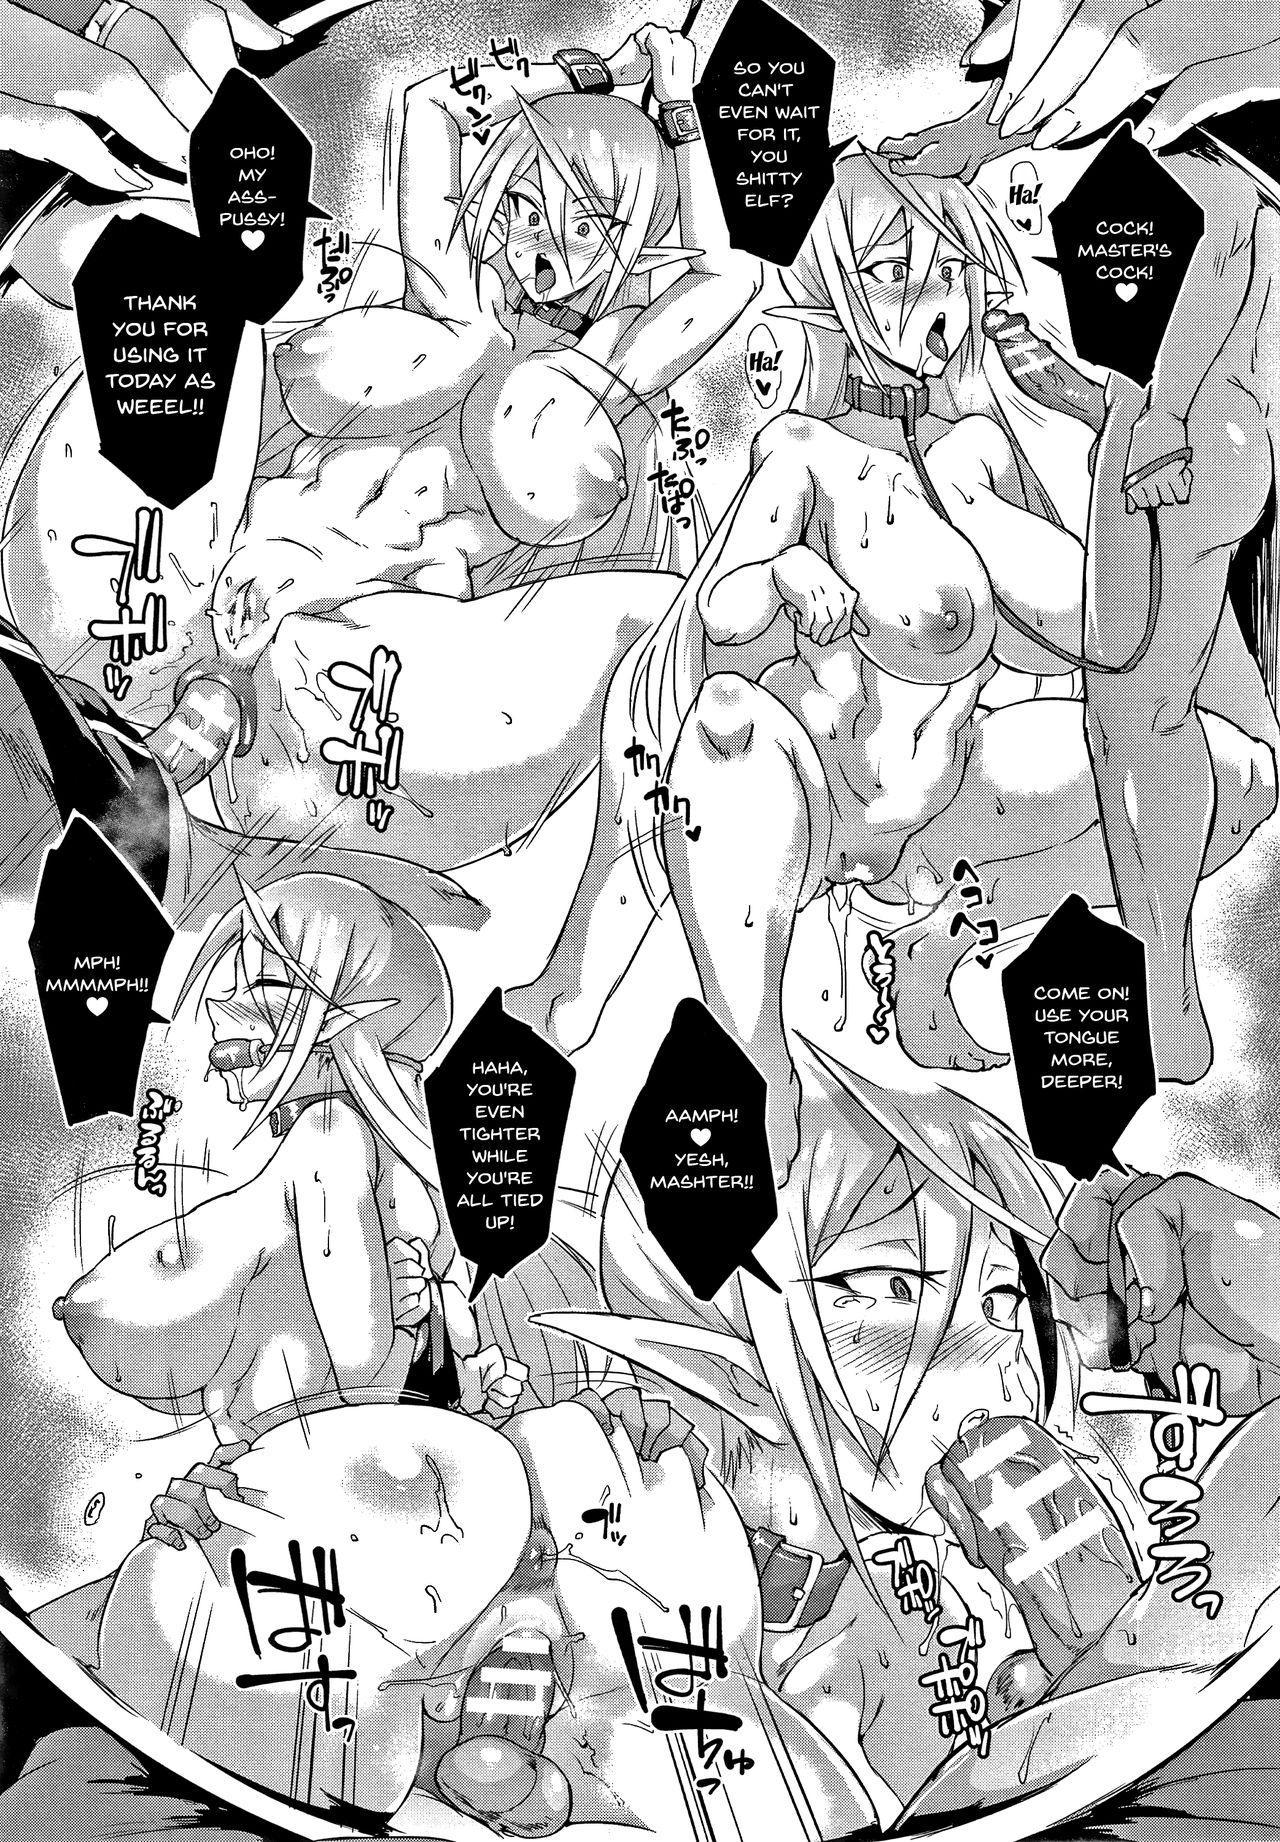 [Fan no Hitori] Sennen Reijou ~ My Lady, My Master ~  Ch.1-3 [English] {Doujins.com} 35